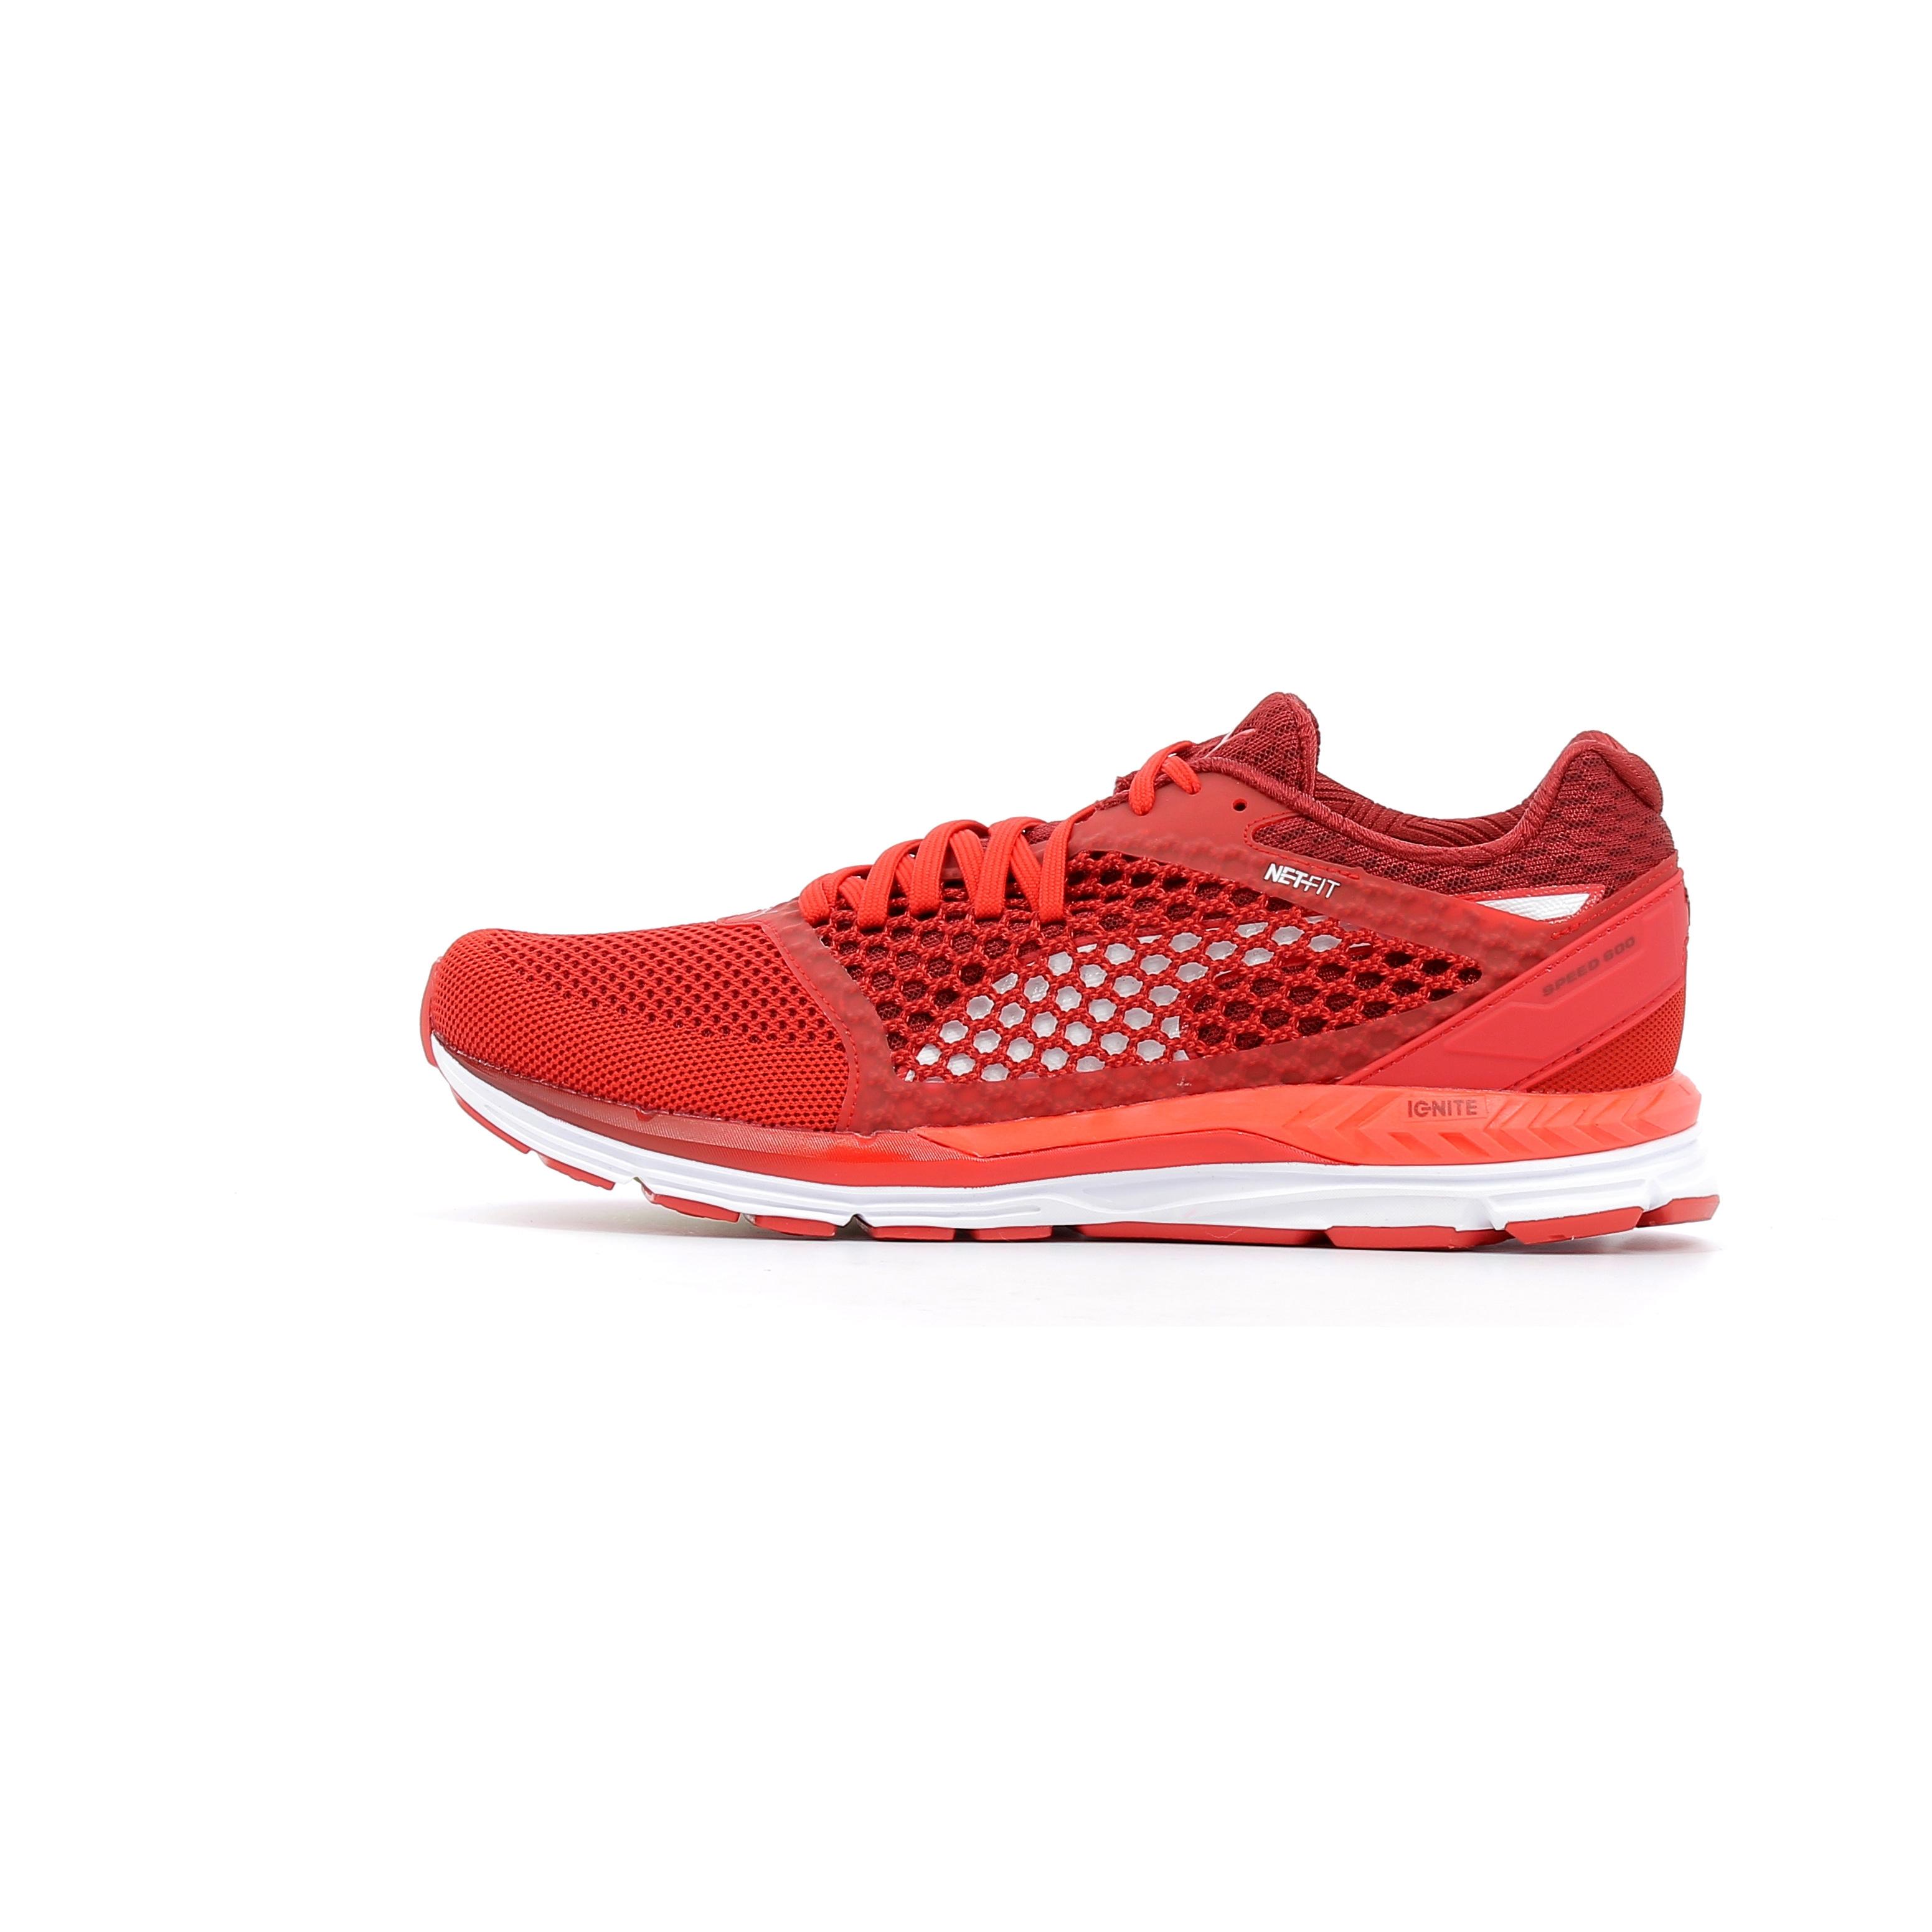 Chaussures de running Puma Speed 600 IGNITE 3